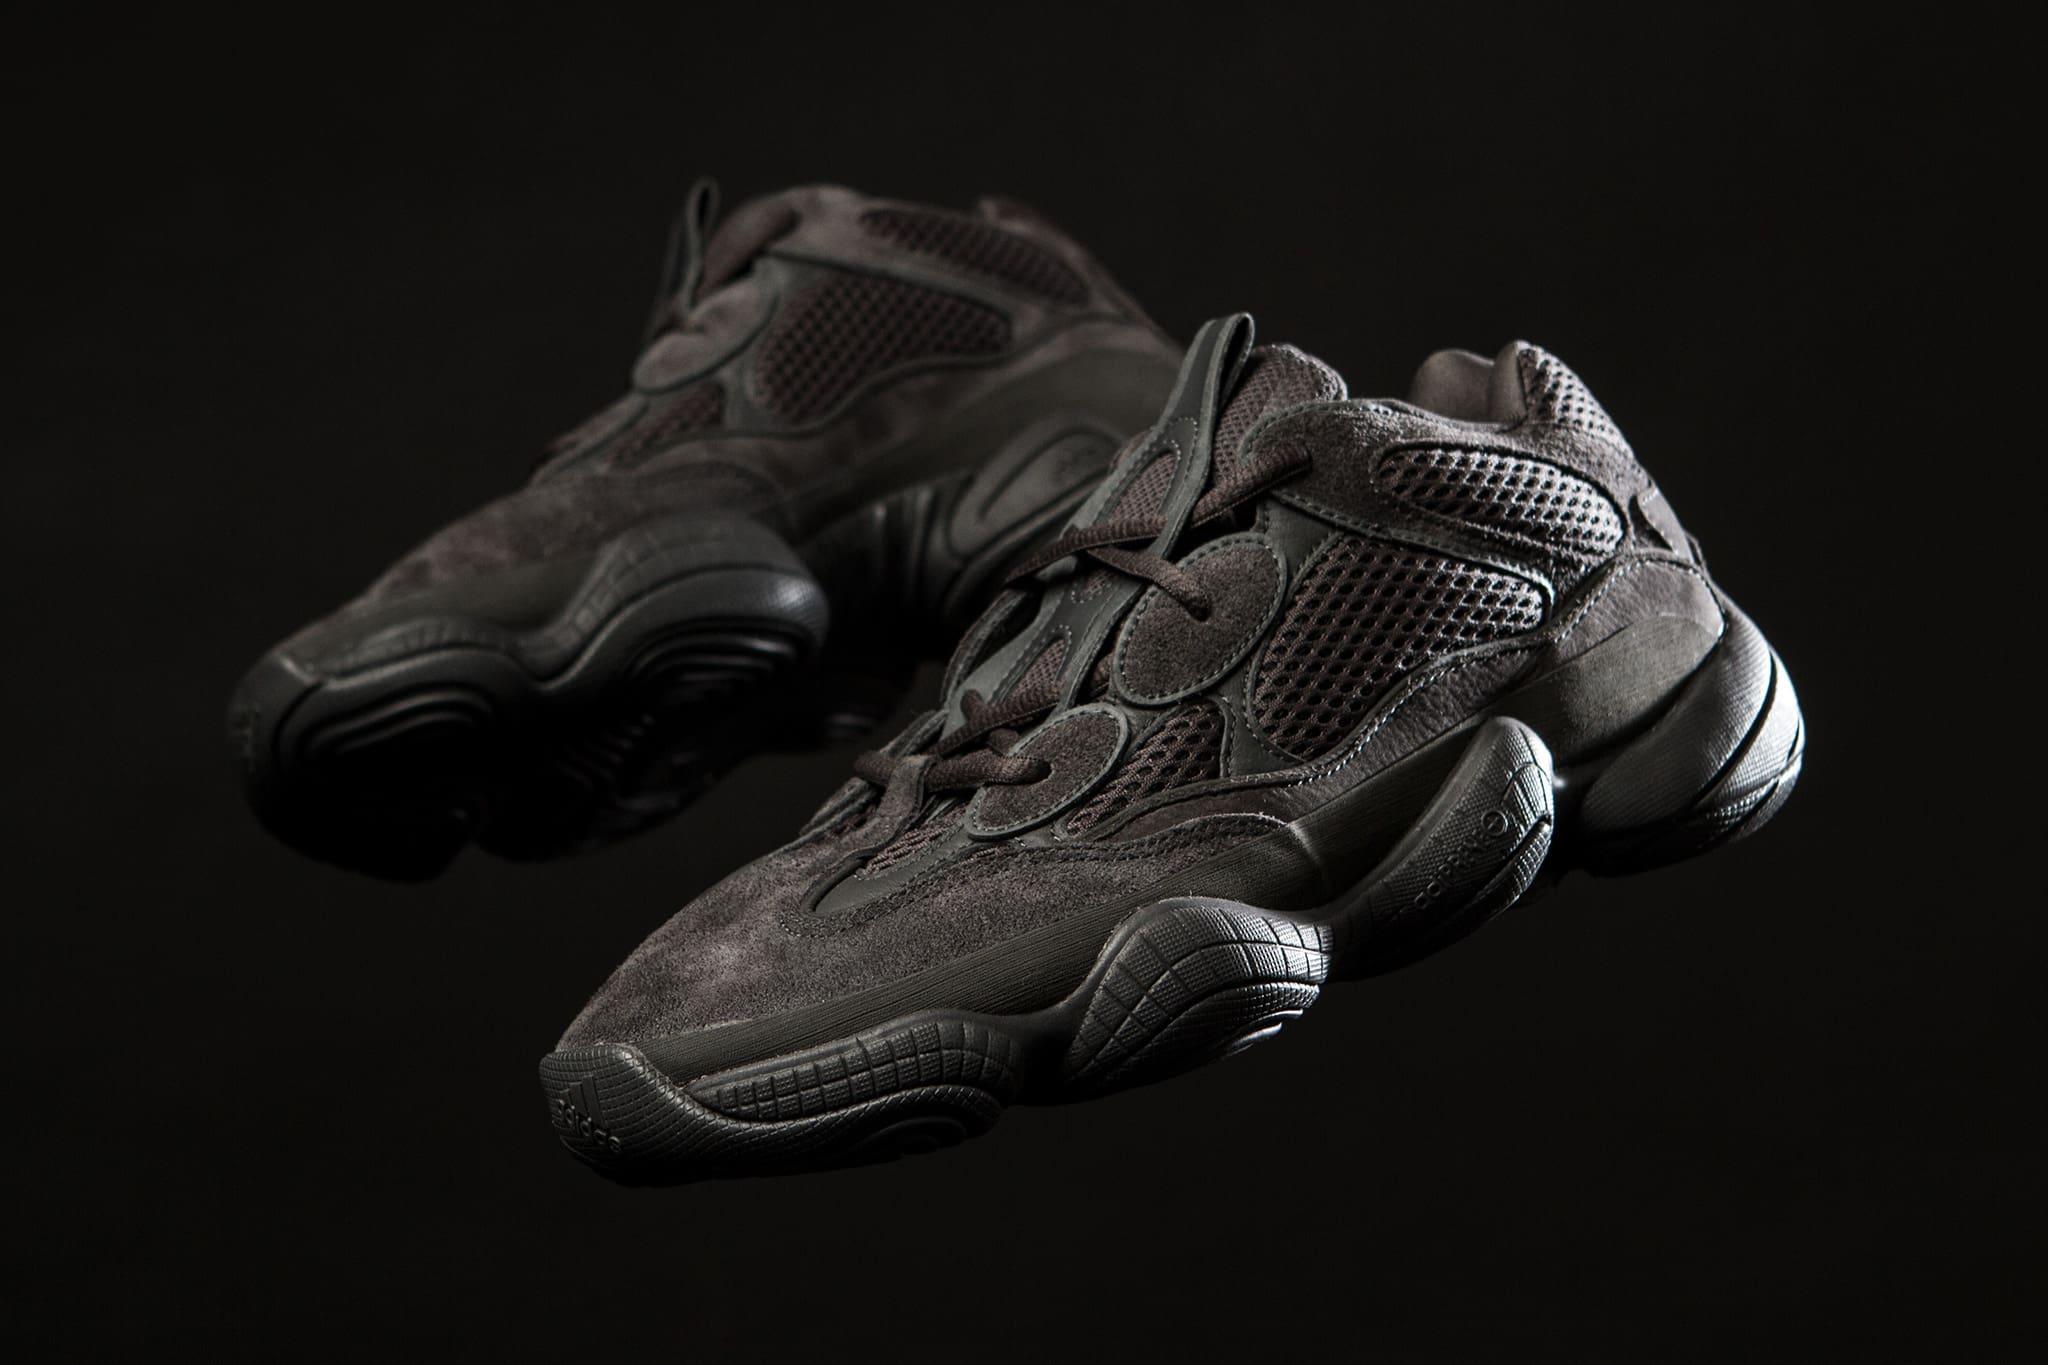 adidas Yeezy 500 'Utility Black